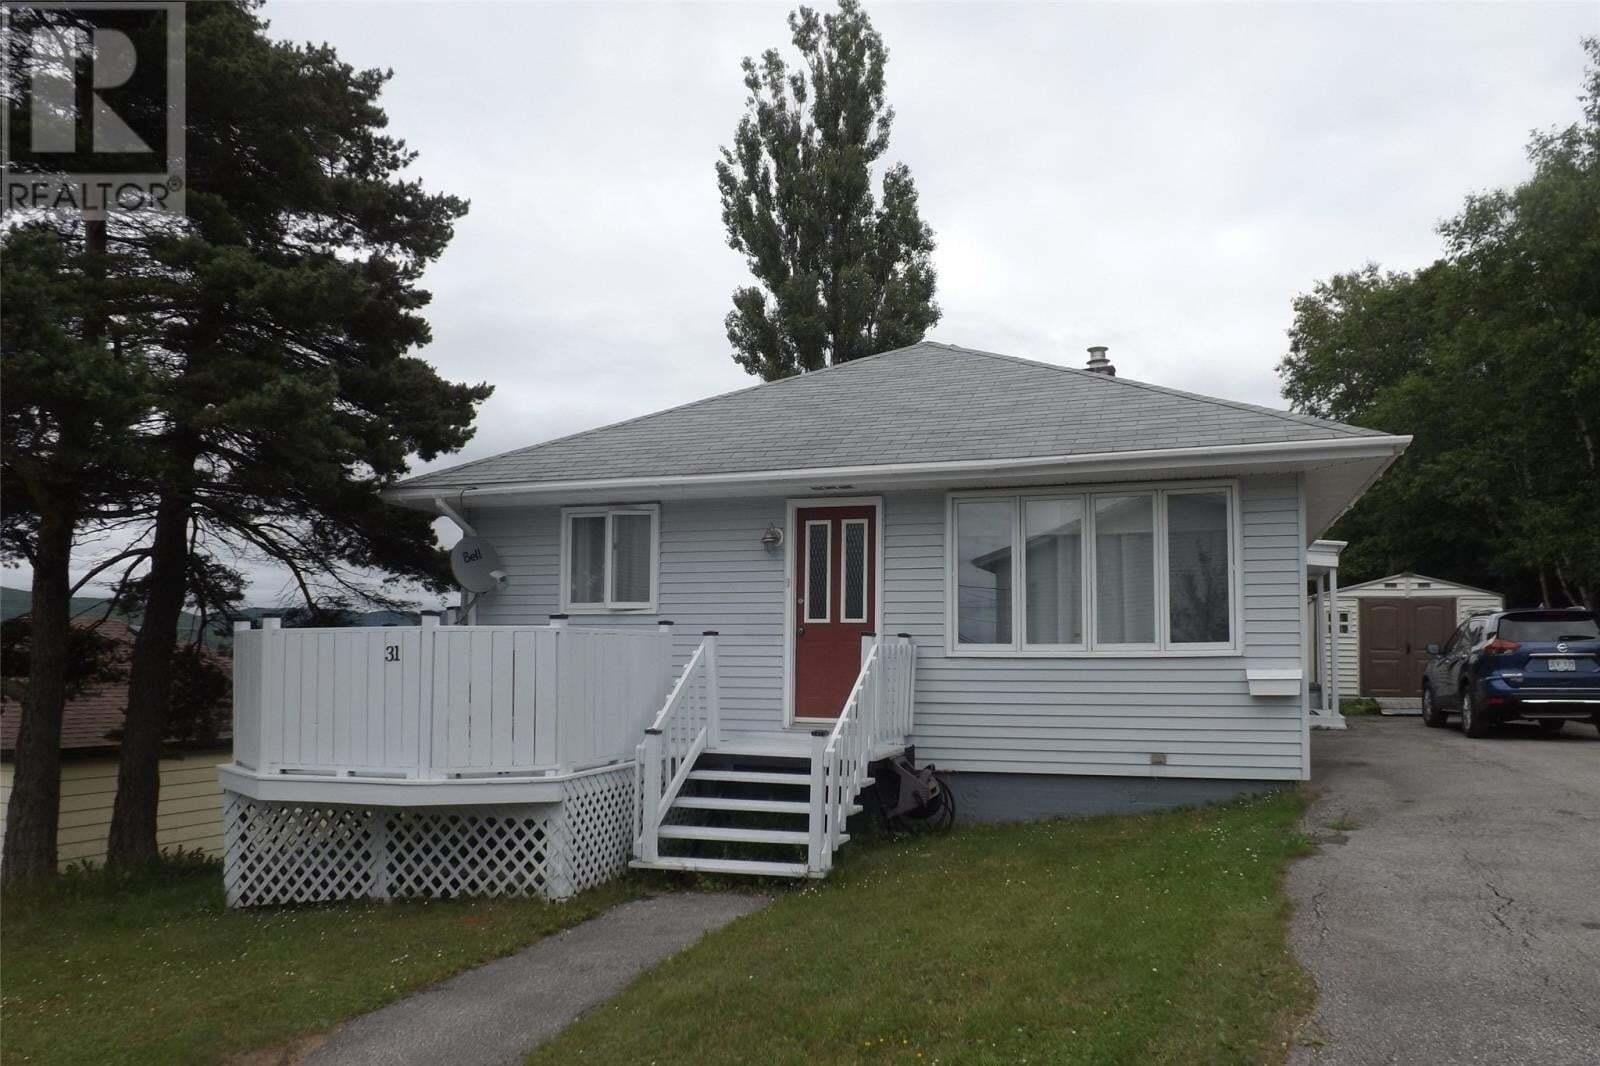 House for sale at 31 Second Ave Corner Brook Newfoundland - MLS: 1218635